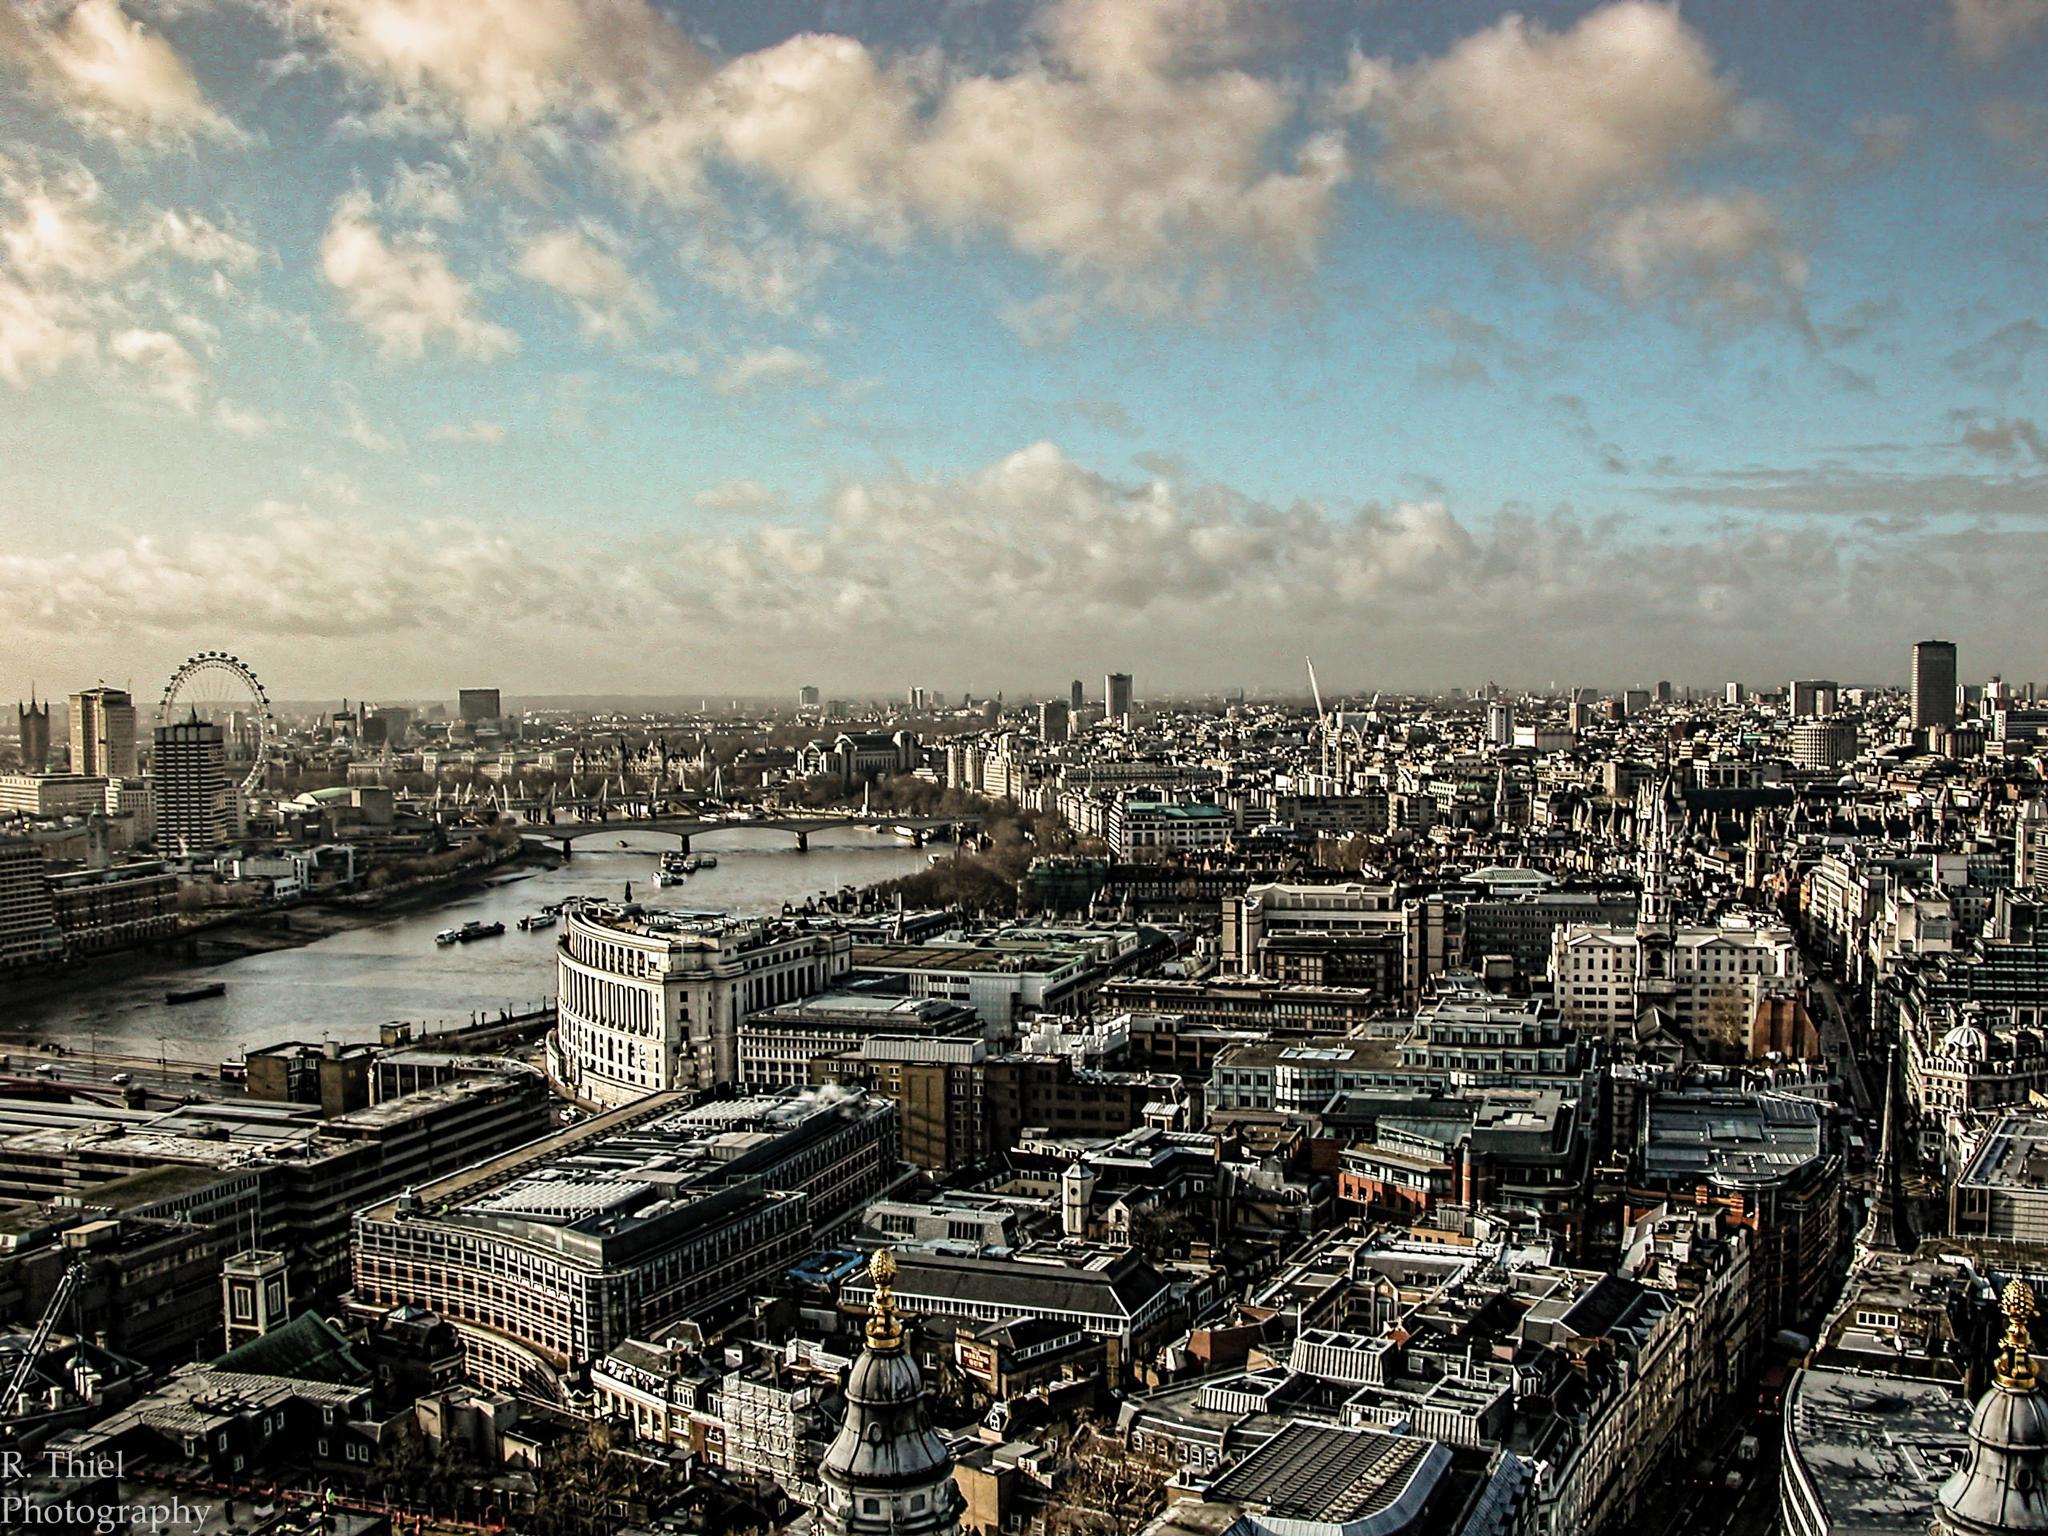 Greater London by Richard Thiel Sartawsky